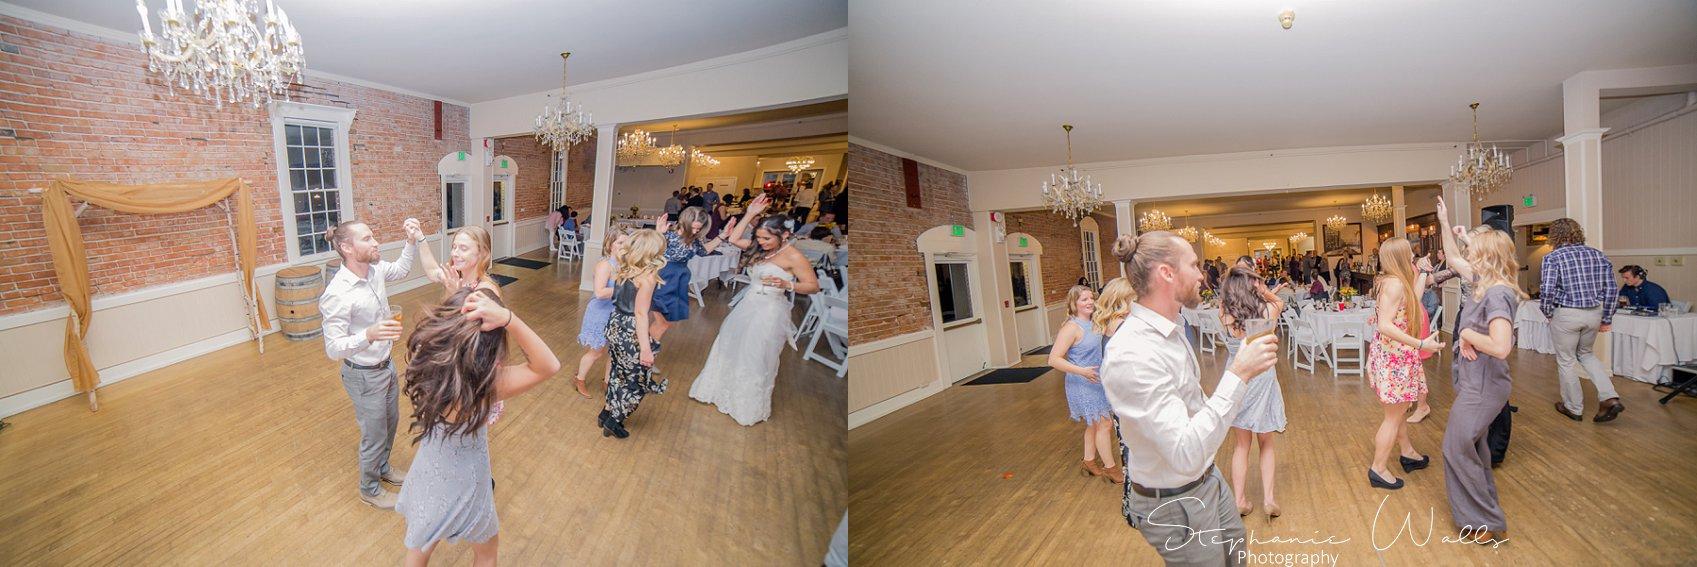 1st Dance Dancing 125 KK & Zack   Hollywood Schoolhouse Wedding   Woodinville, Wa Wedding Photographer